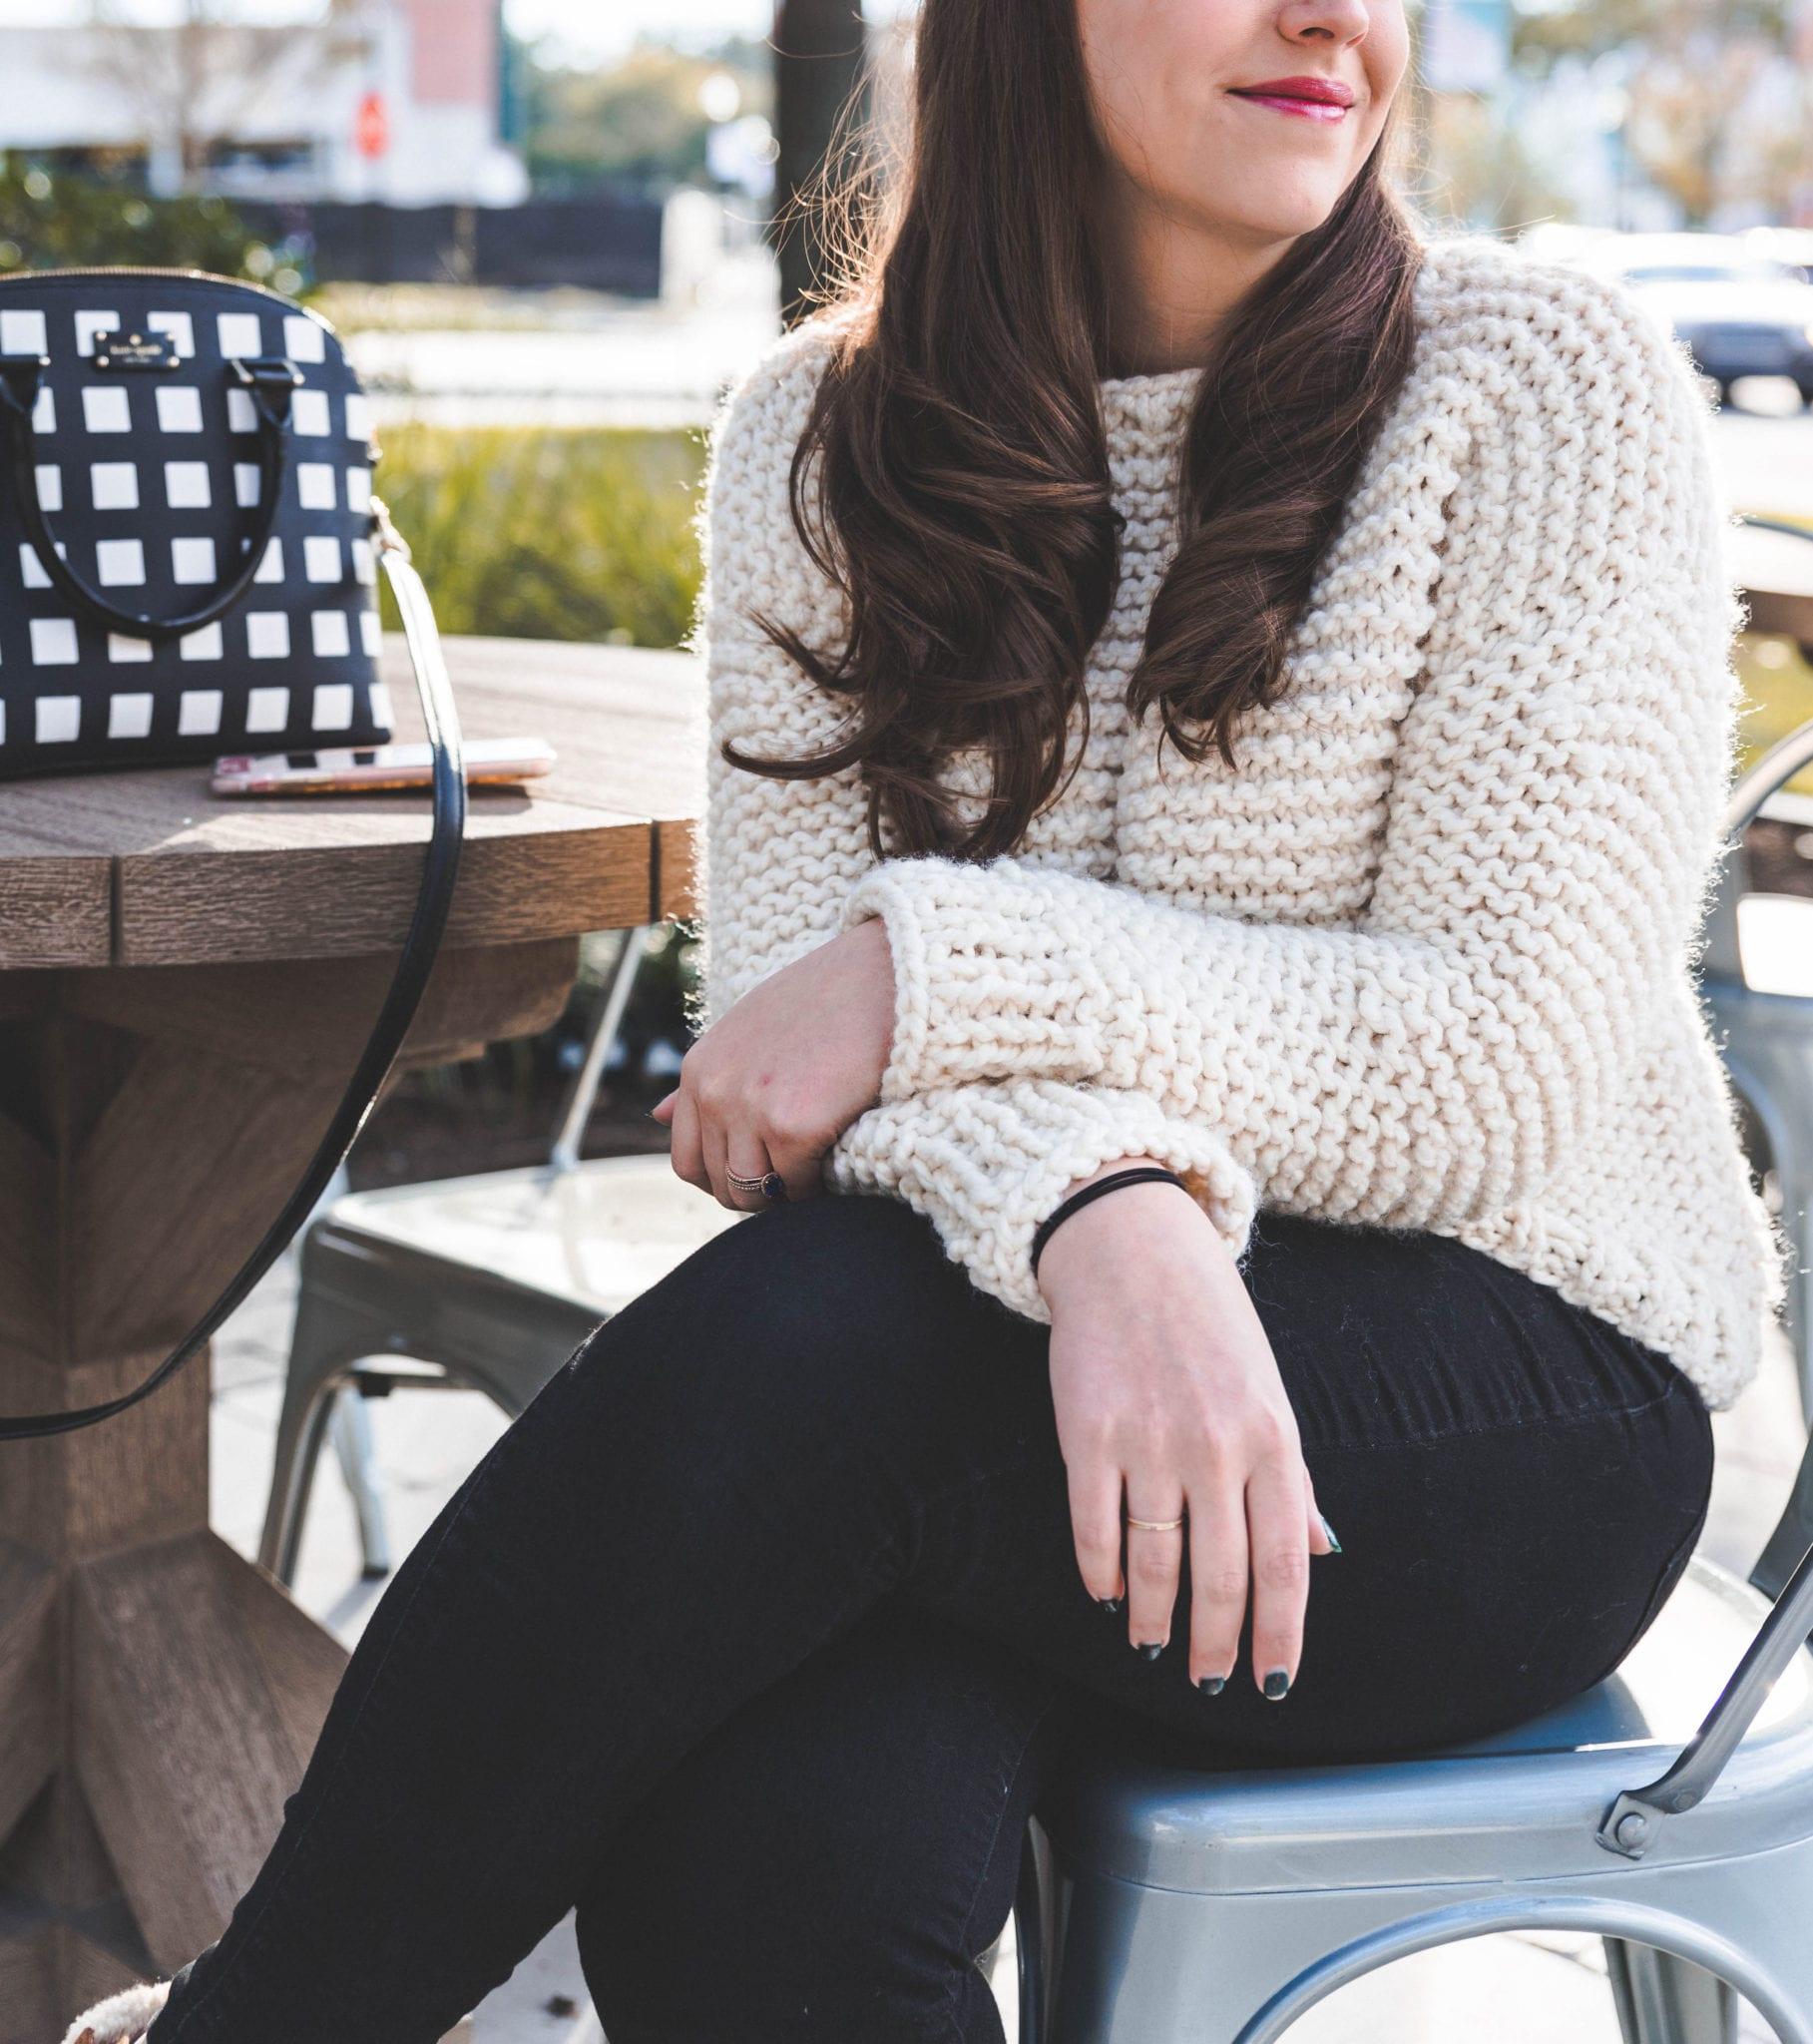 d5e2694b553187 Crochet Everyday Cardigan   3. Crochet Le Nuage Wrap Triangle Scarf. This  easy ...